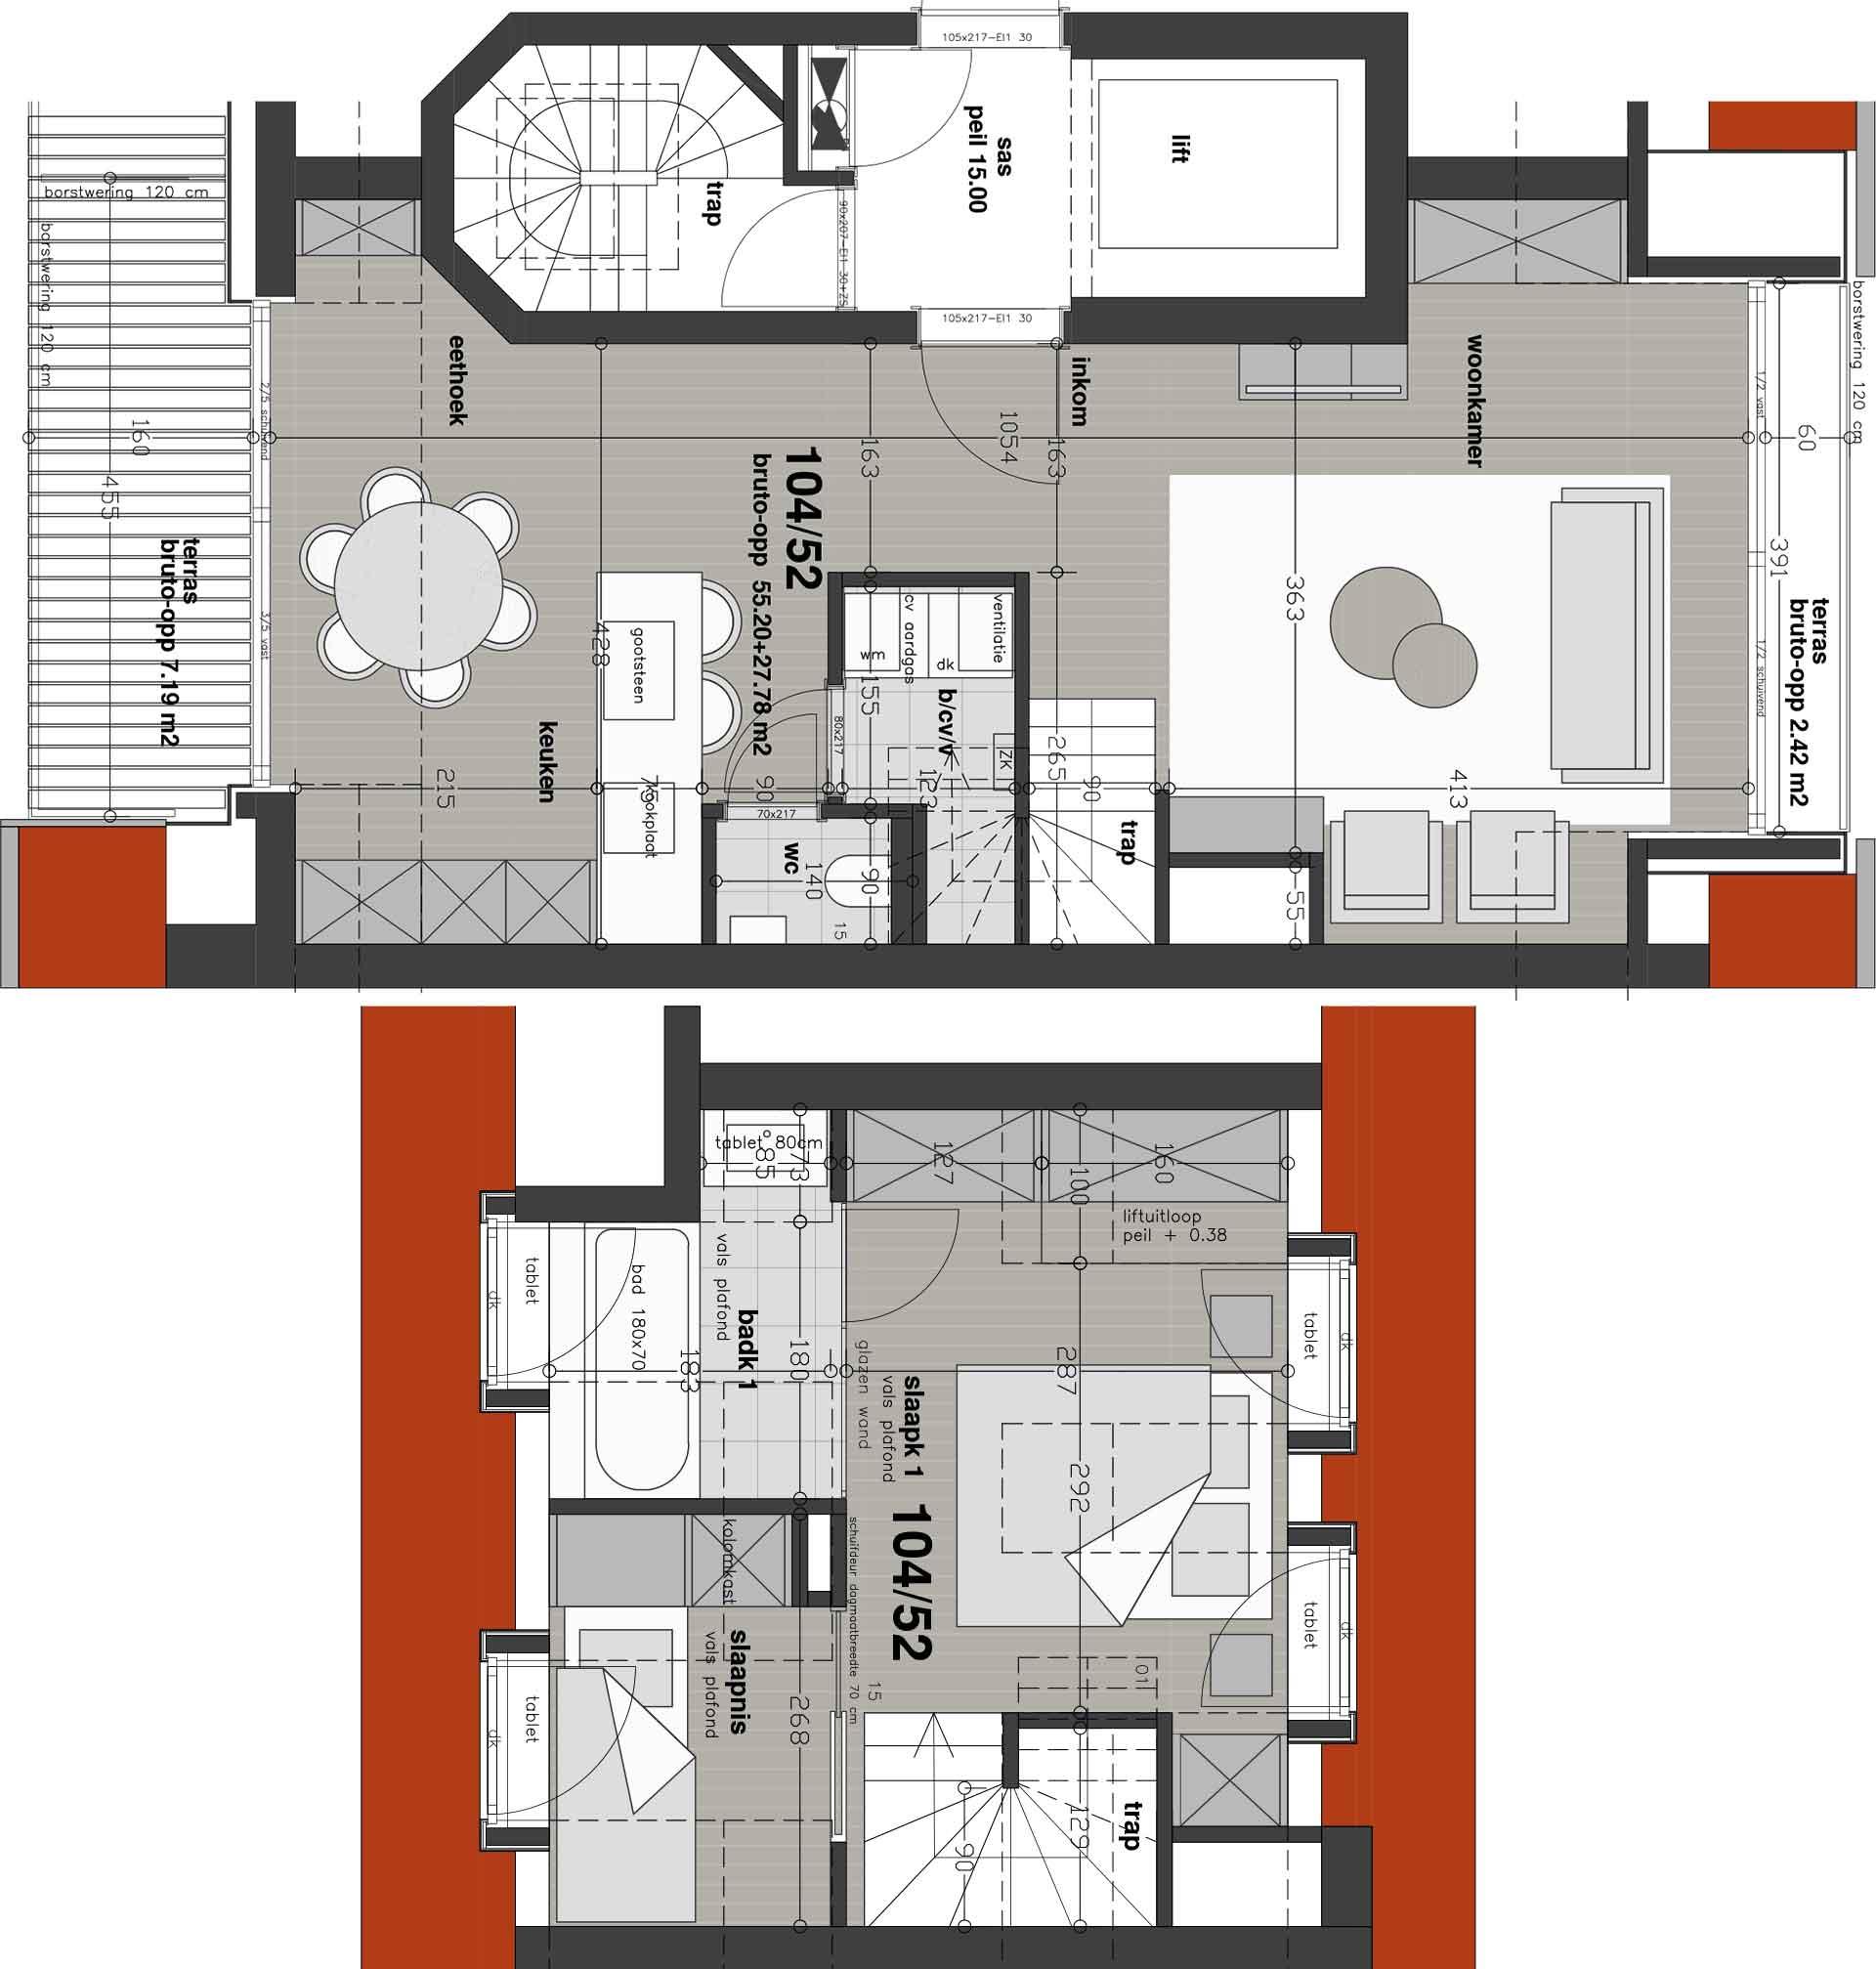 Residentie <br/> Chagall - image appartement-te-koop-knokke-heist-residentie-chagall-plan-52-variant on https://hoprom.be